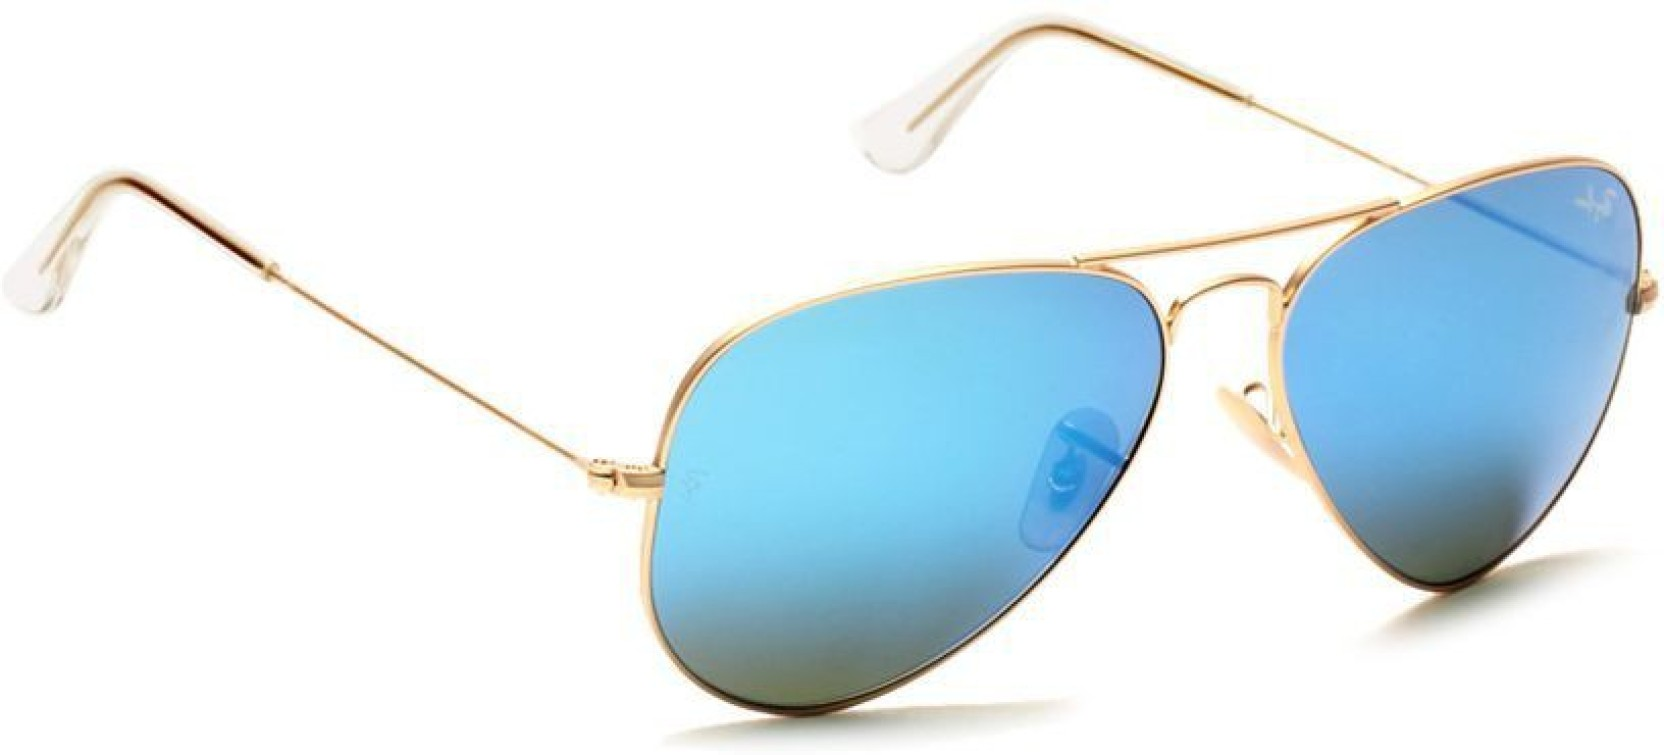 cb5fb49f5a Buy RB Aviator Sunglasses Blue For Men   Women Online   Best Prices ...